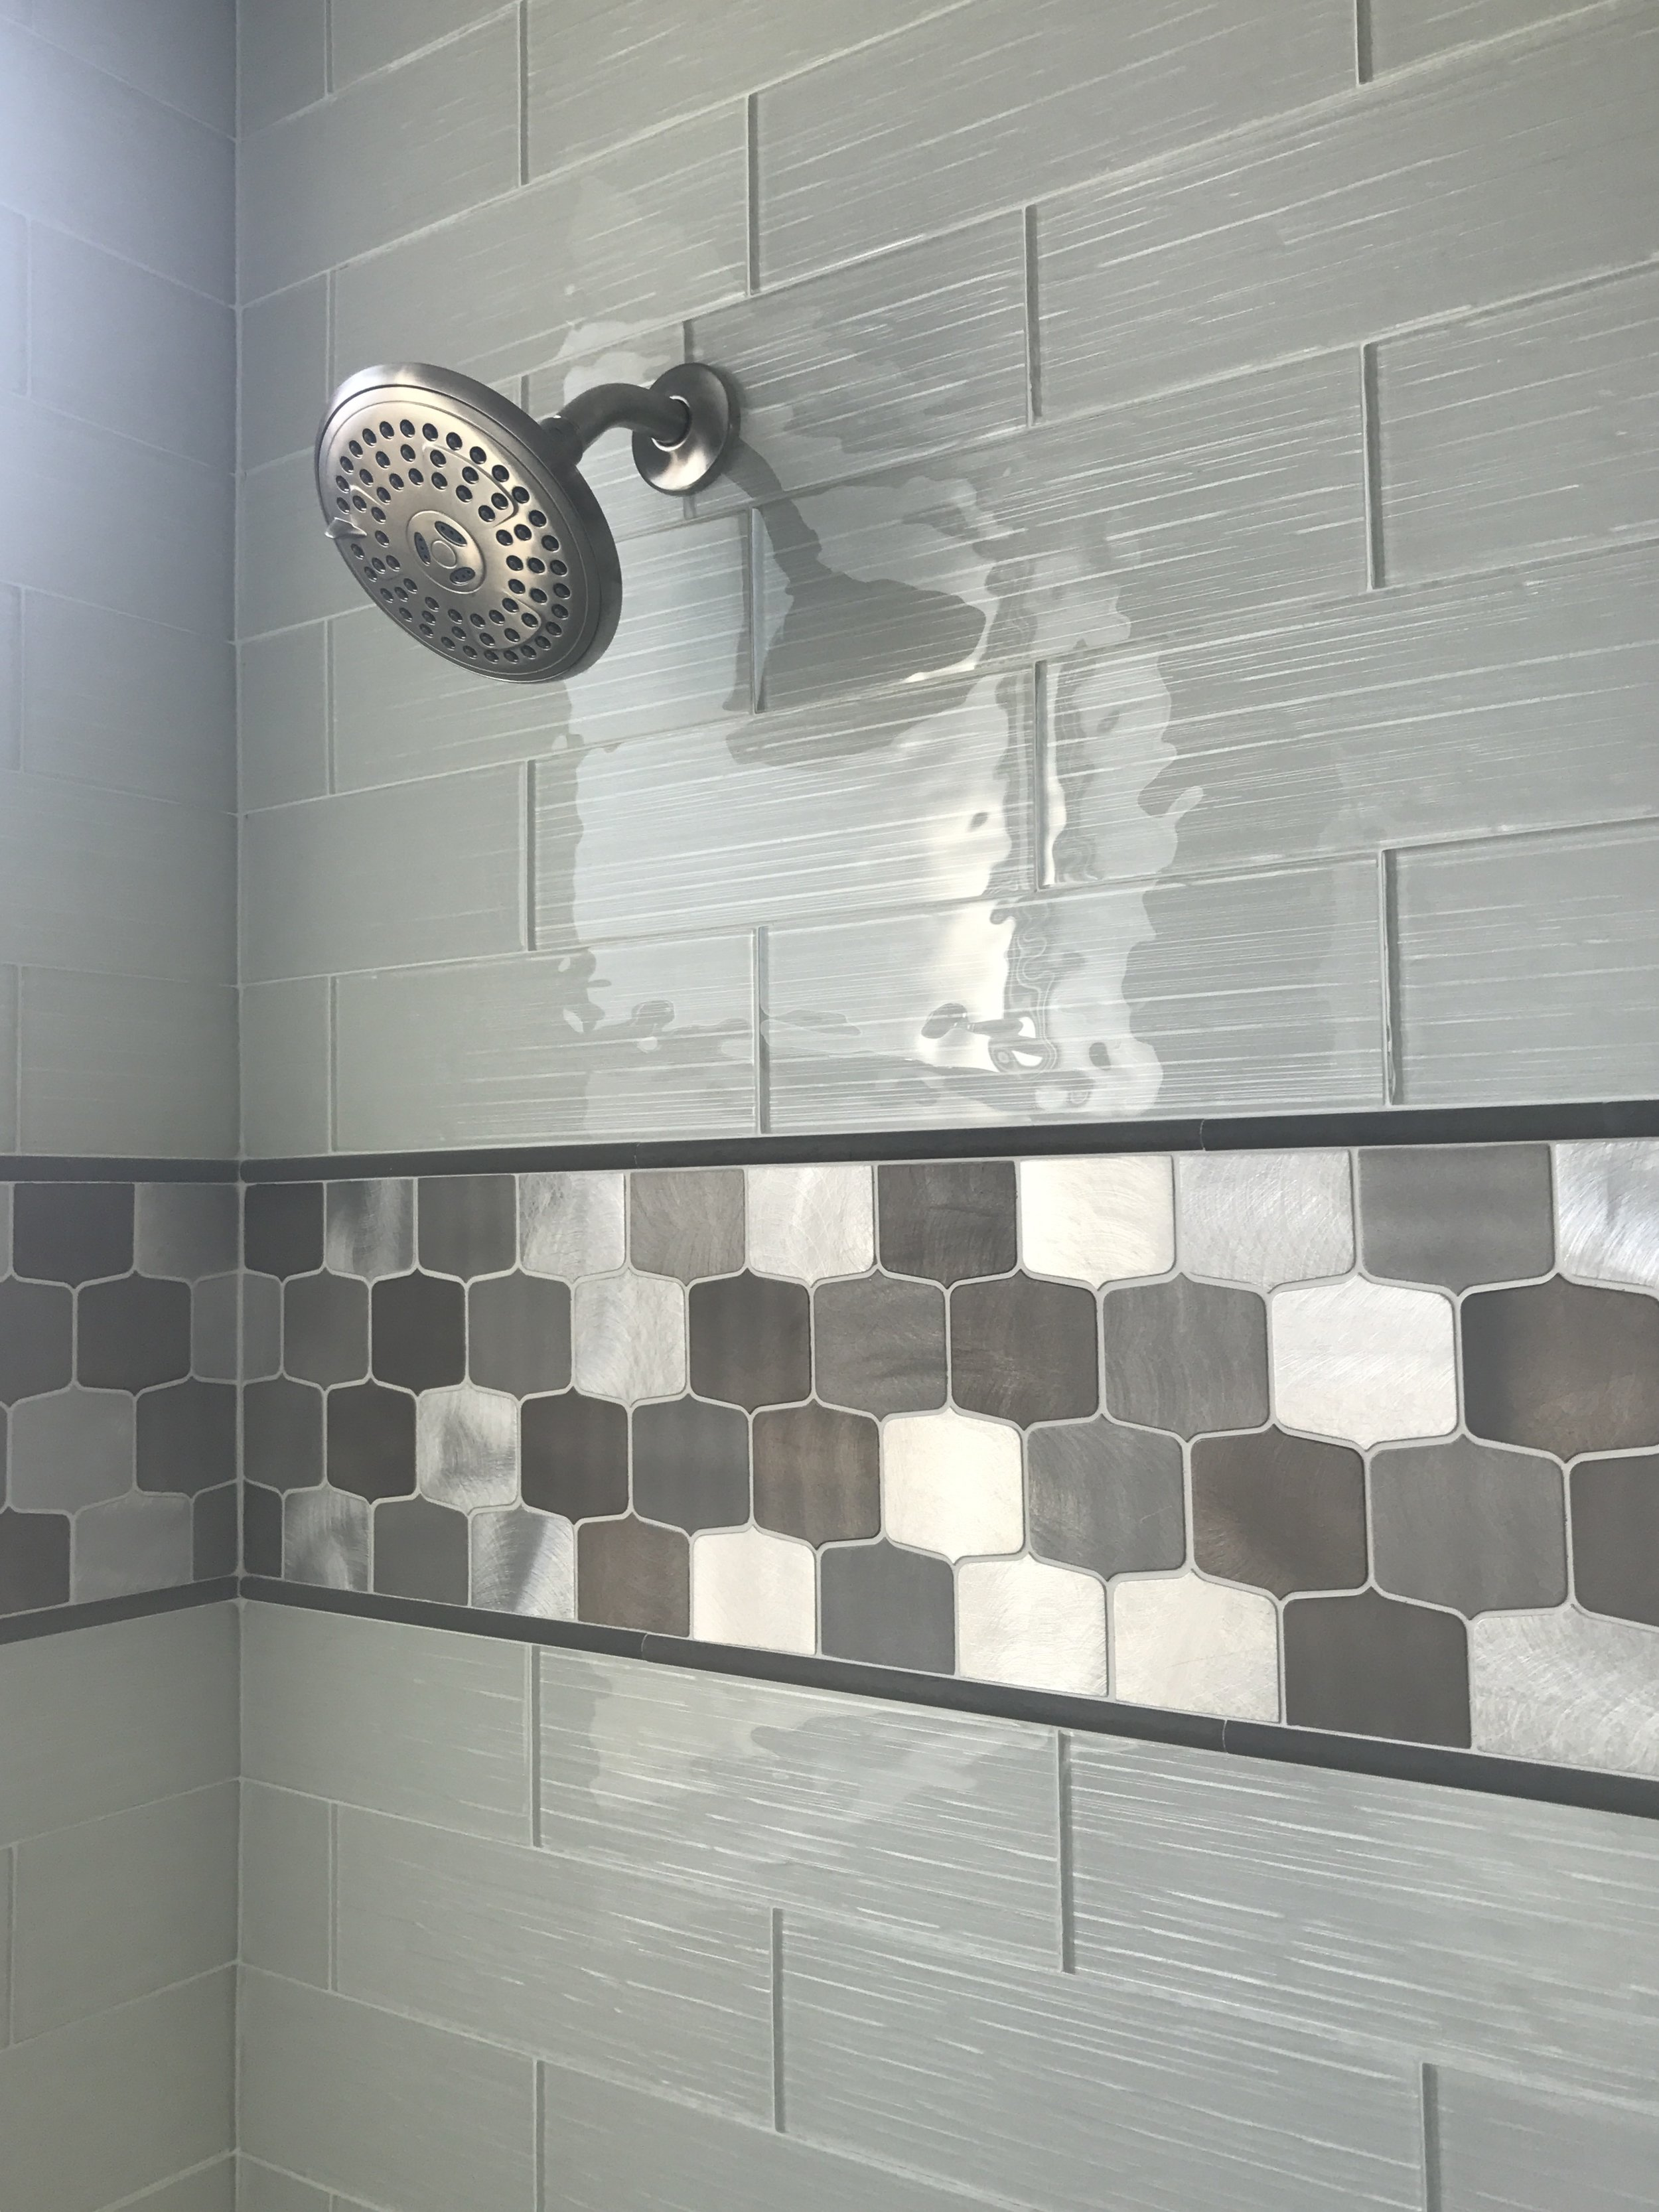 Guest Bathroom Tile, Deco Tile and Shower Head